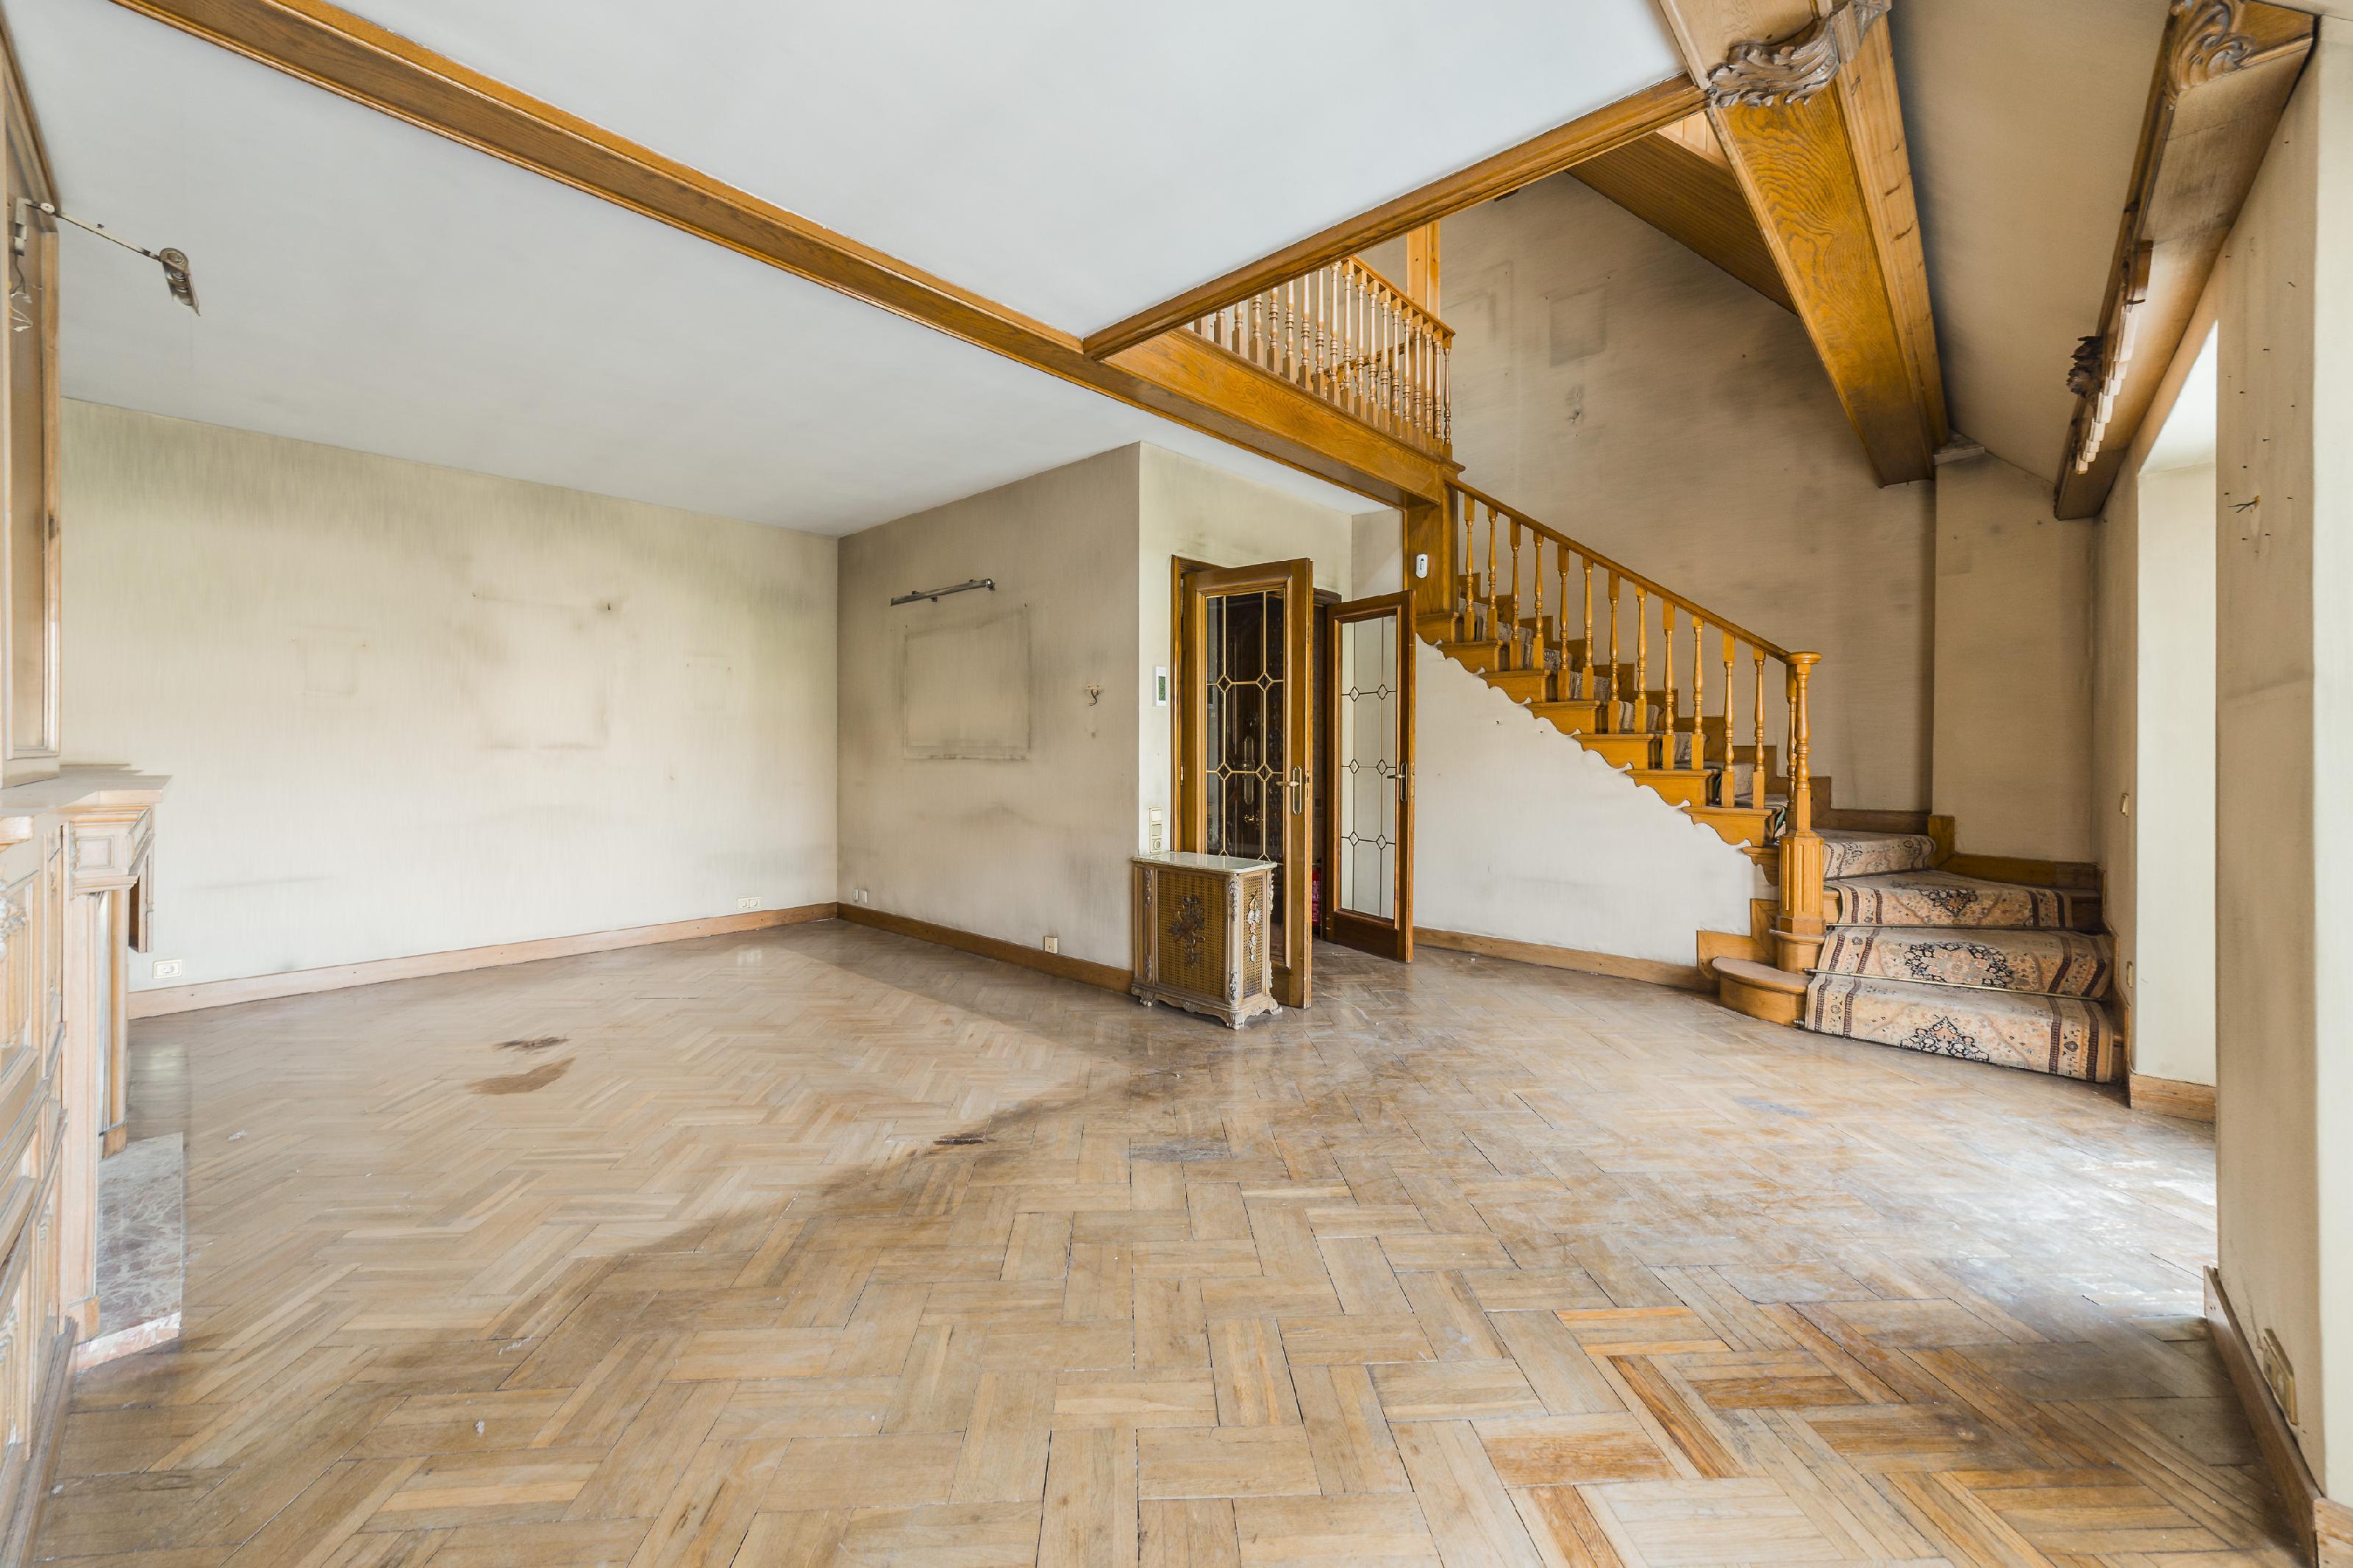 249314 Penthouse for sale in Sarrià-Sant Gervasi, Sant Gervasi-Galvany 13